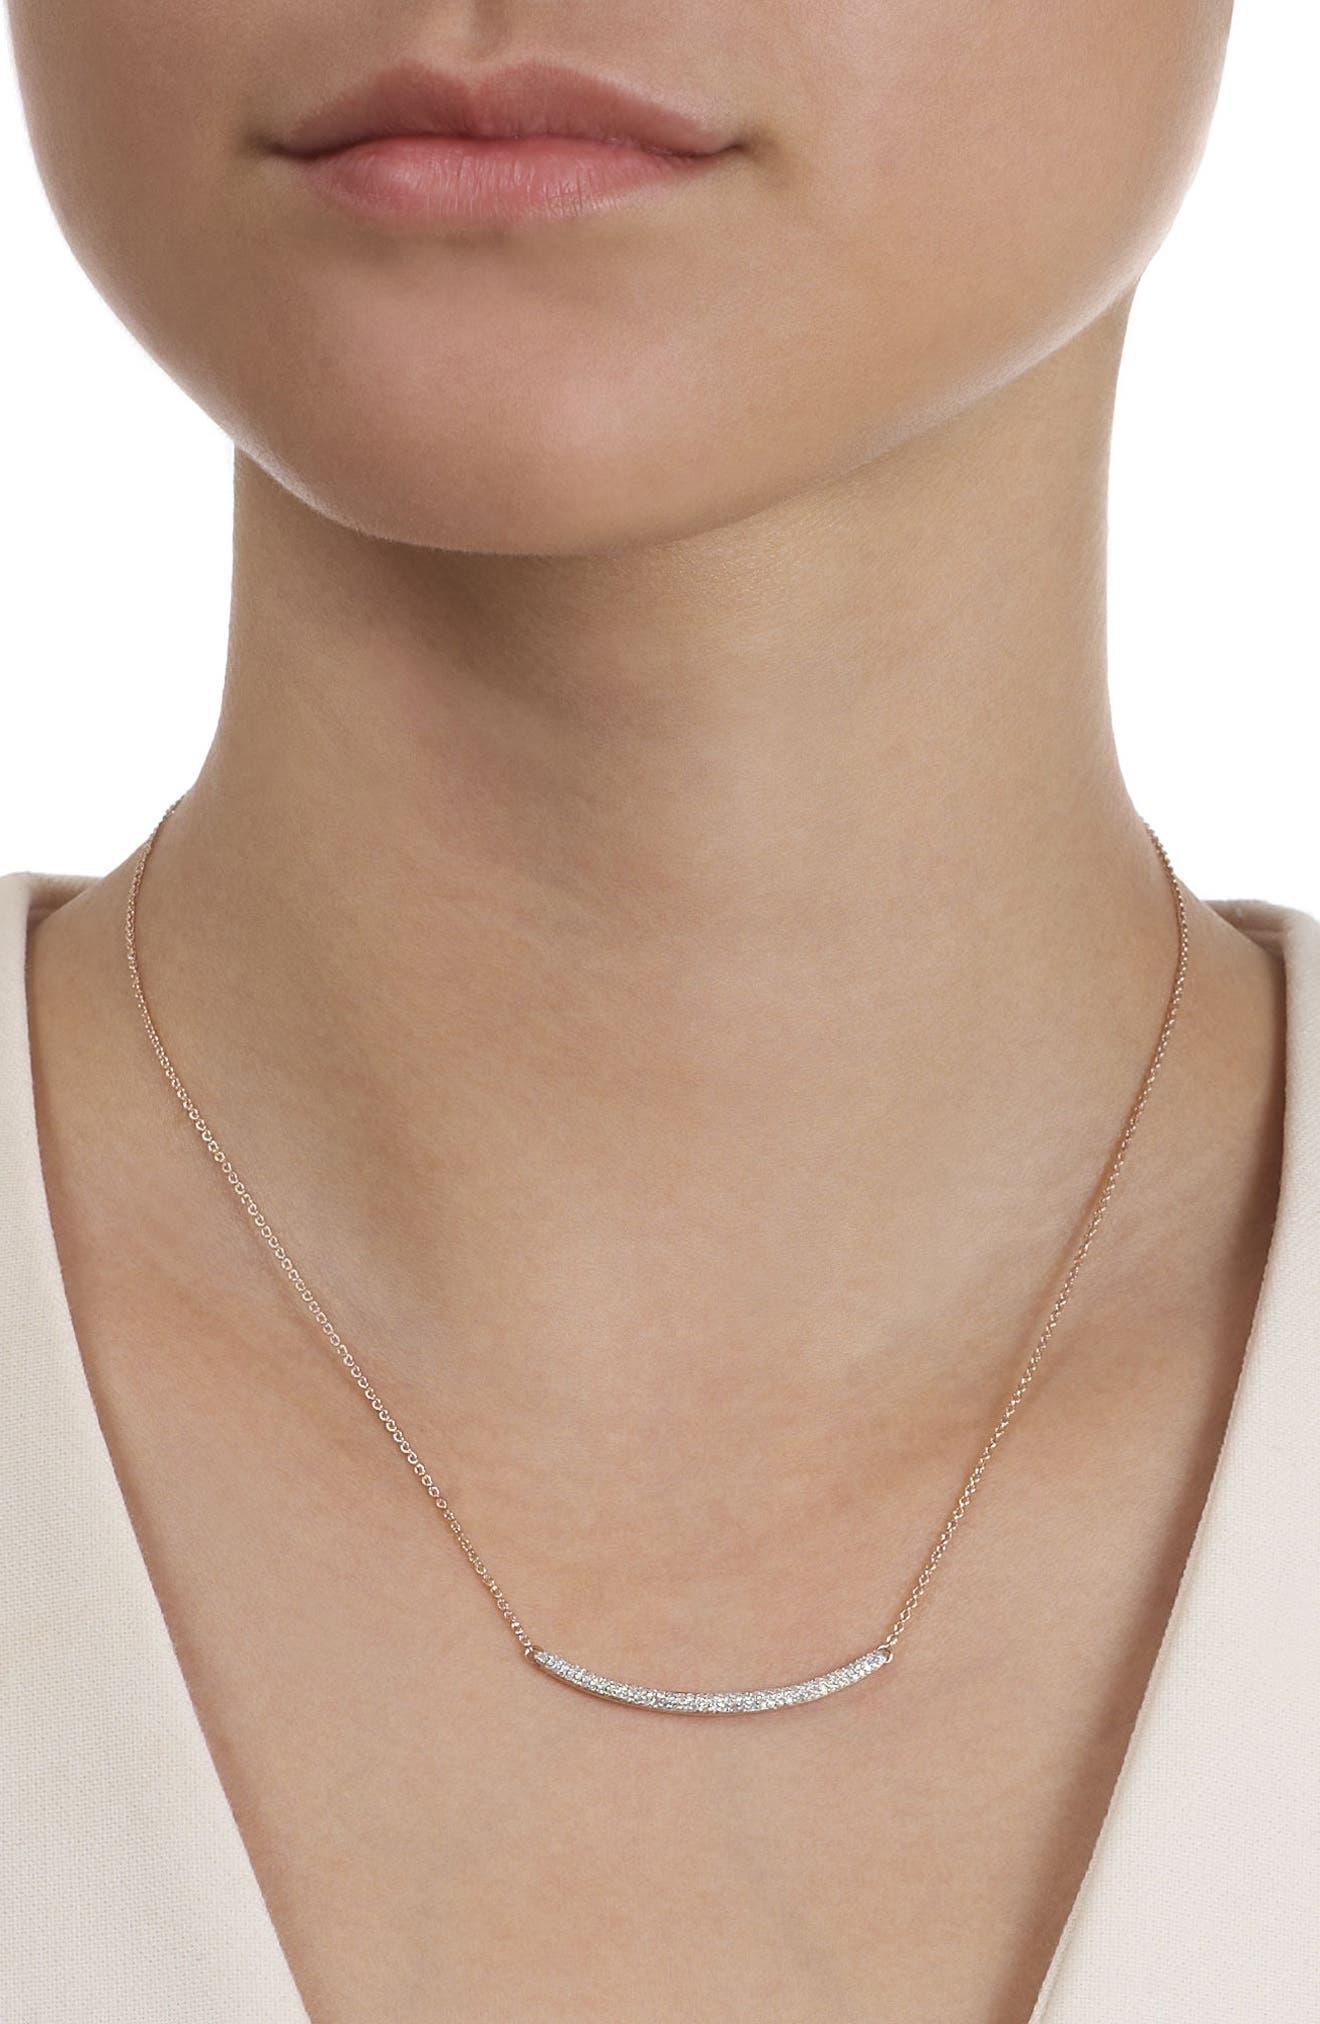 MONICA VINADER, Skinny Diamond Necklace, Alternate thumbnail 4, color, ROSE GOLD